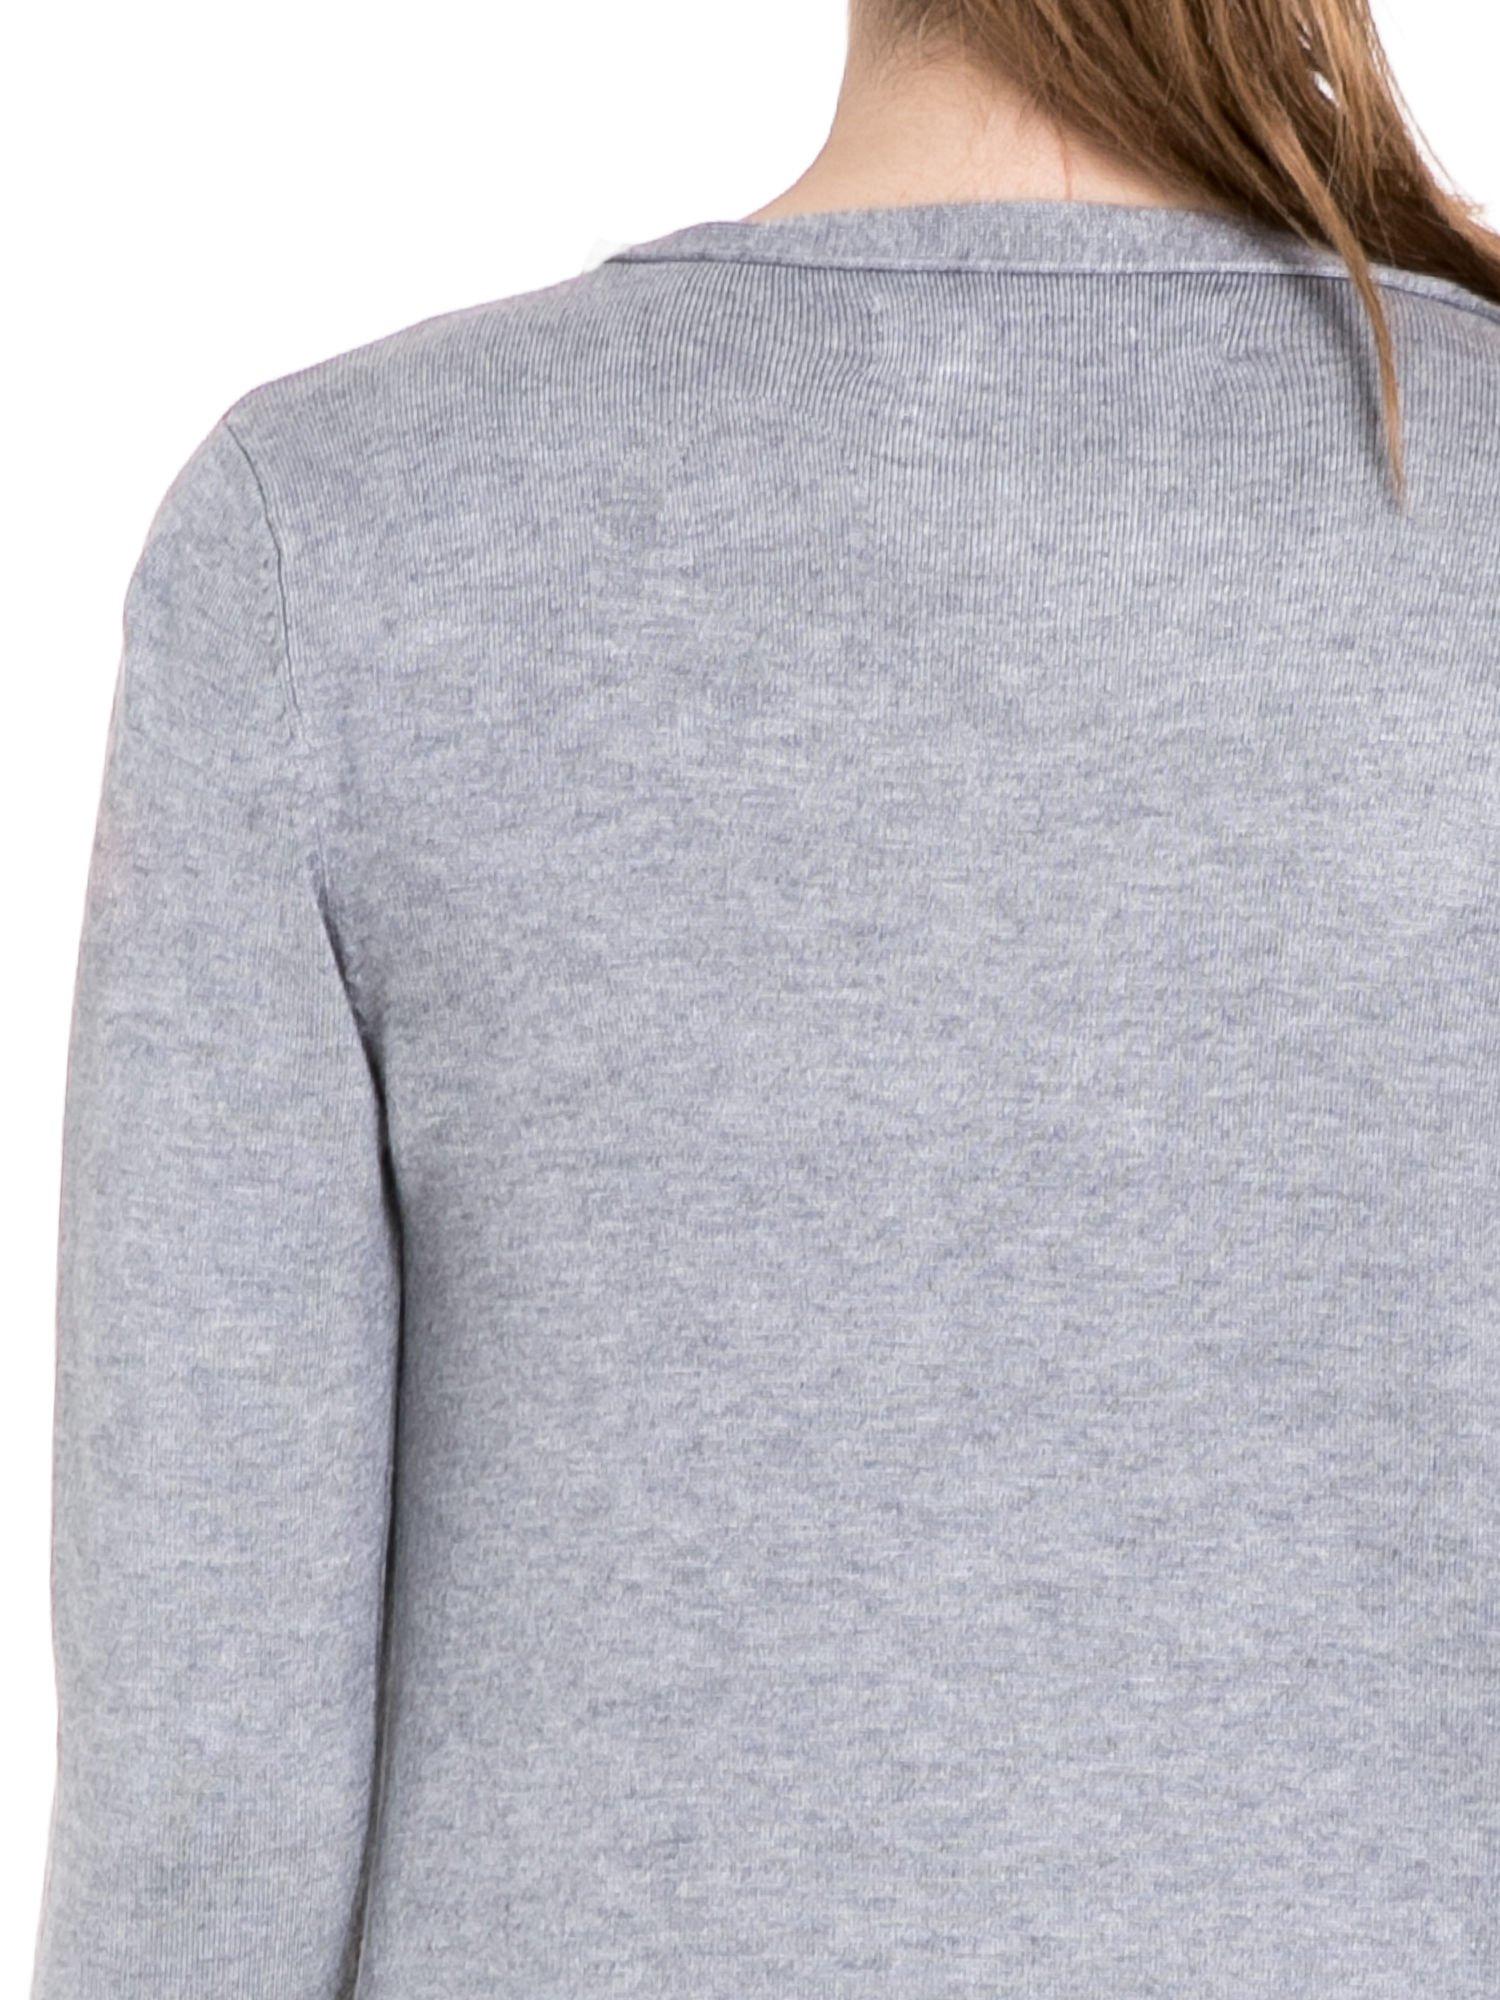 Szary sweter narzutka o kroju waterfall                                  zdj.                                  7